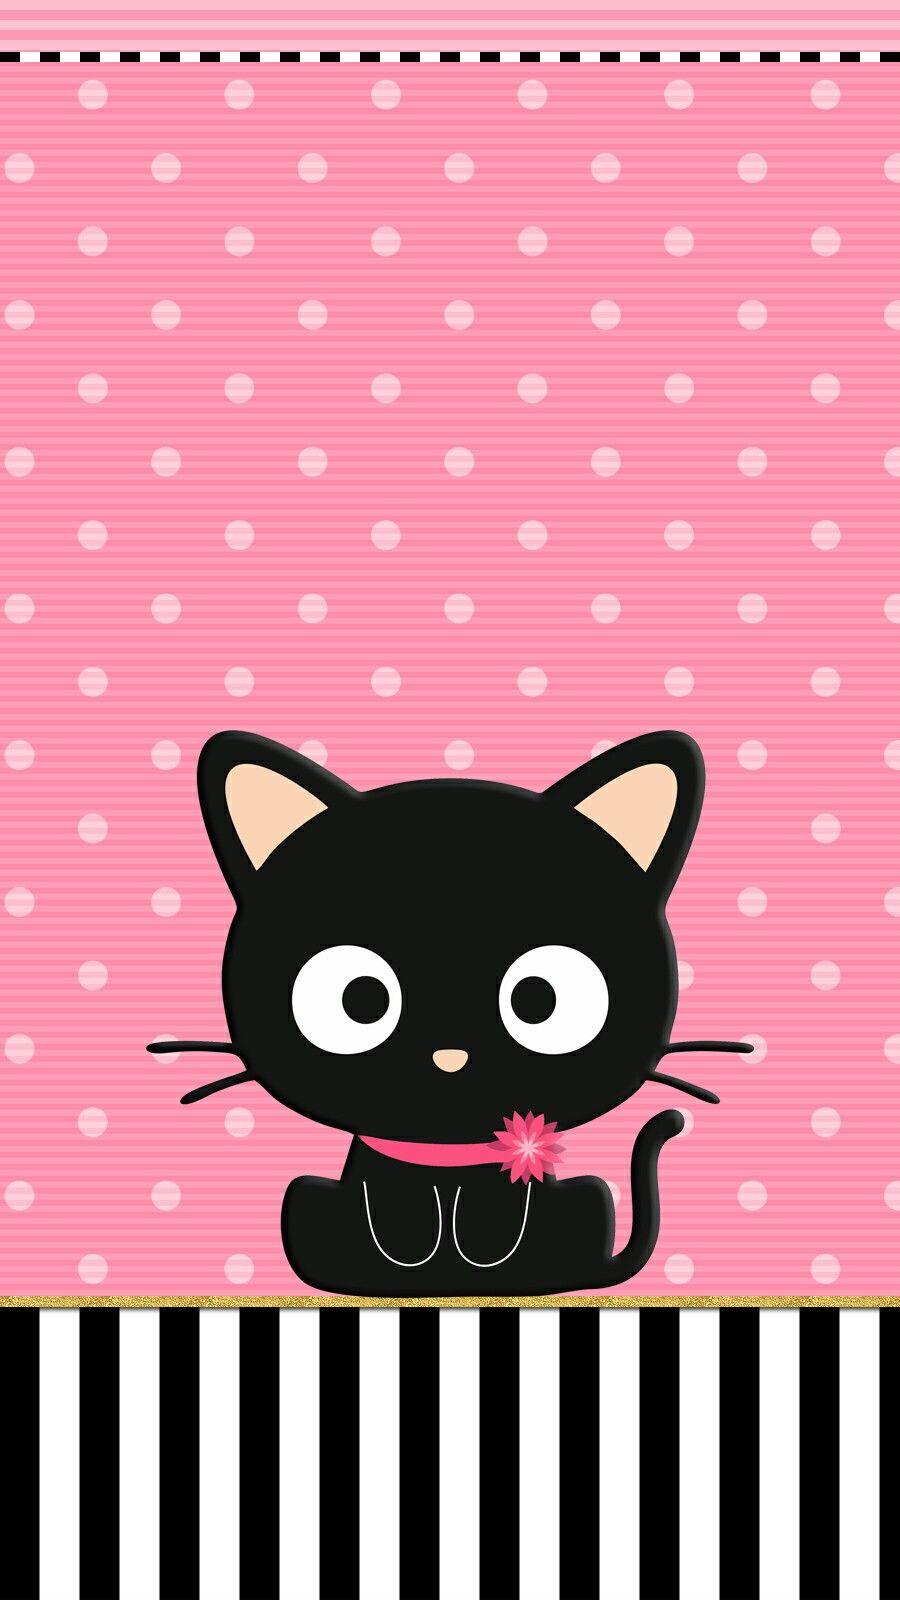 Wallpaper iphone keroppi -  Chococat Wallpaper Iphone Pink